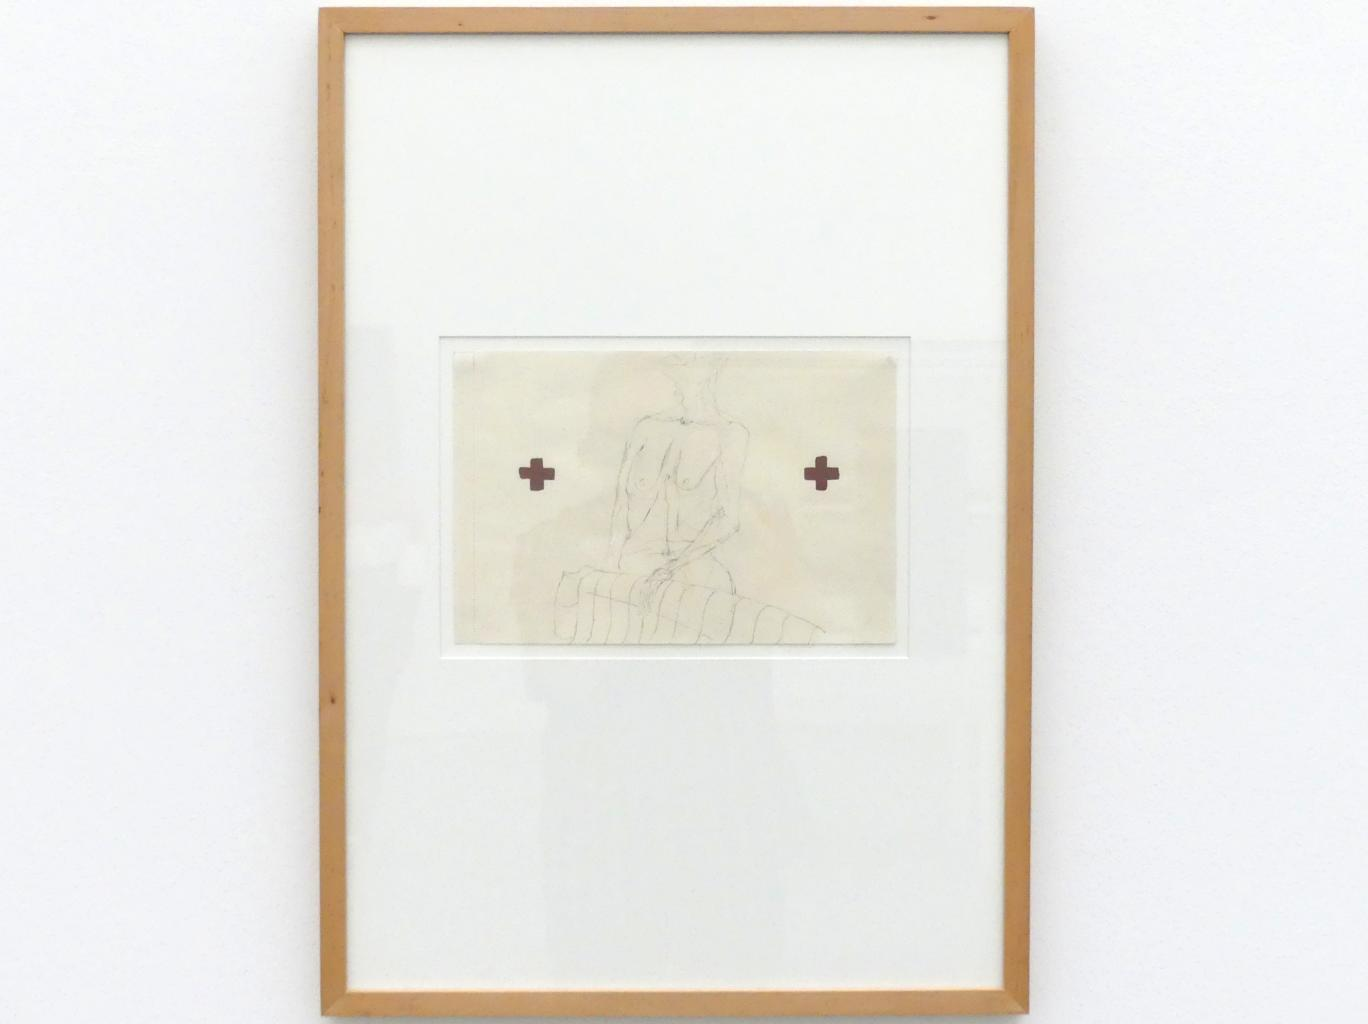 Joseph Beuys: unbetitelt, 1956